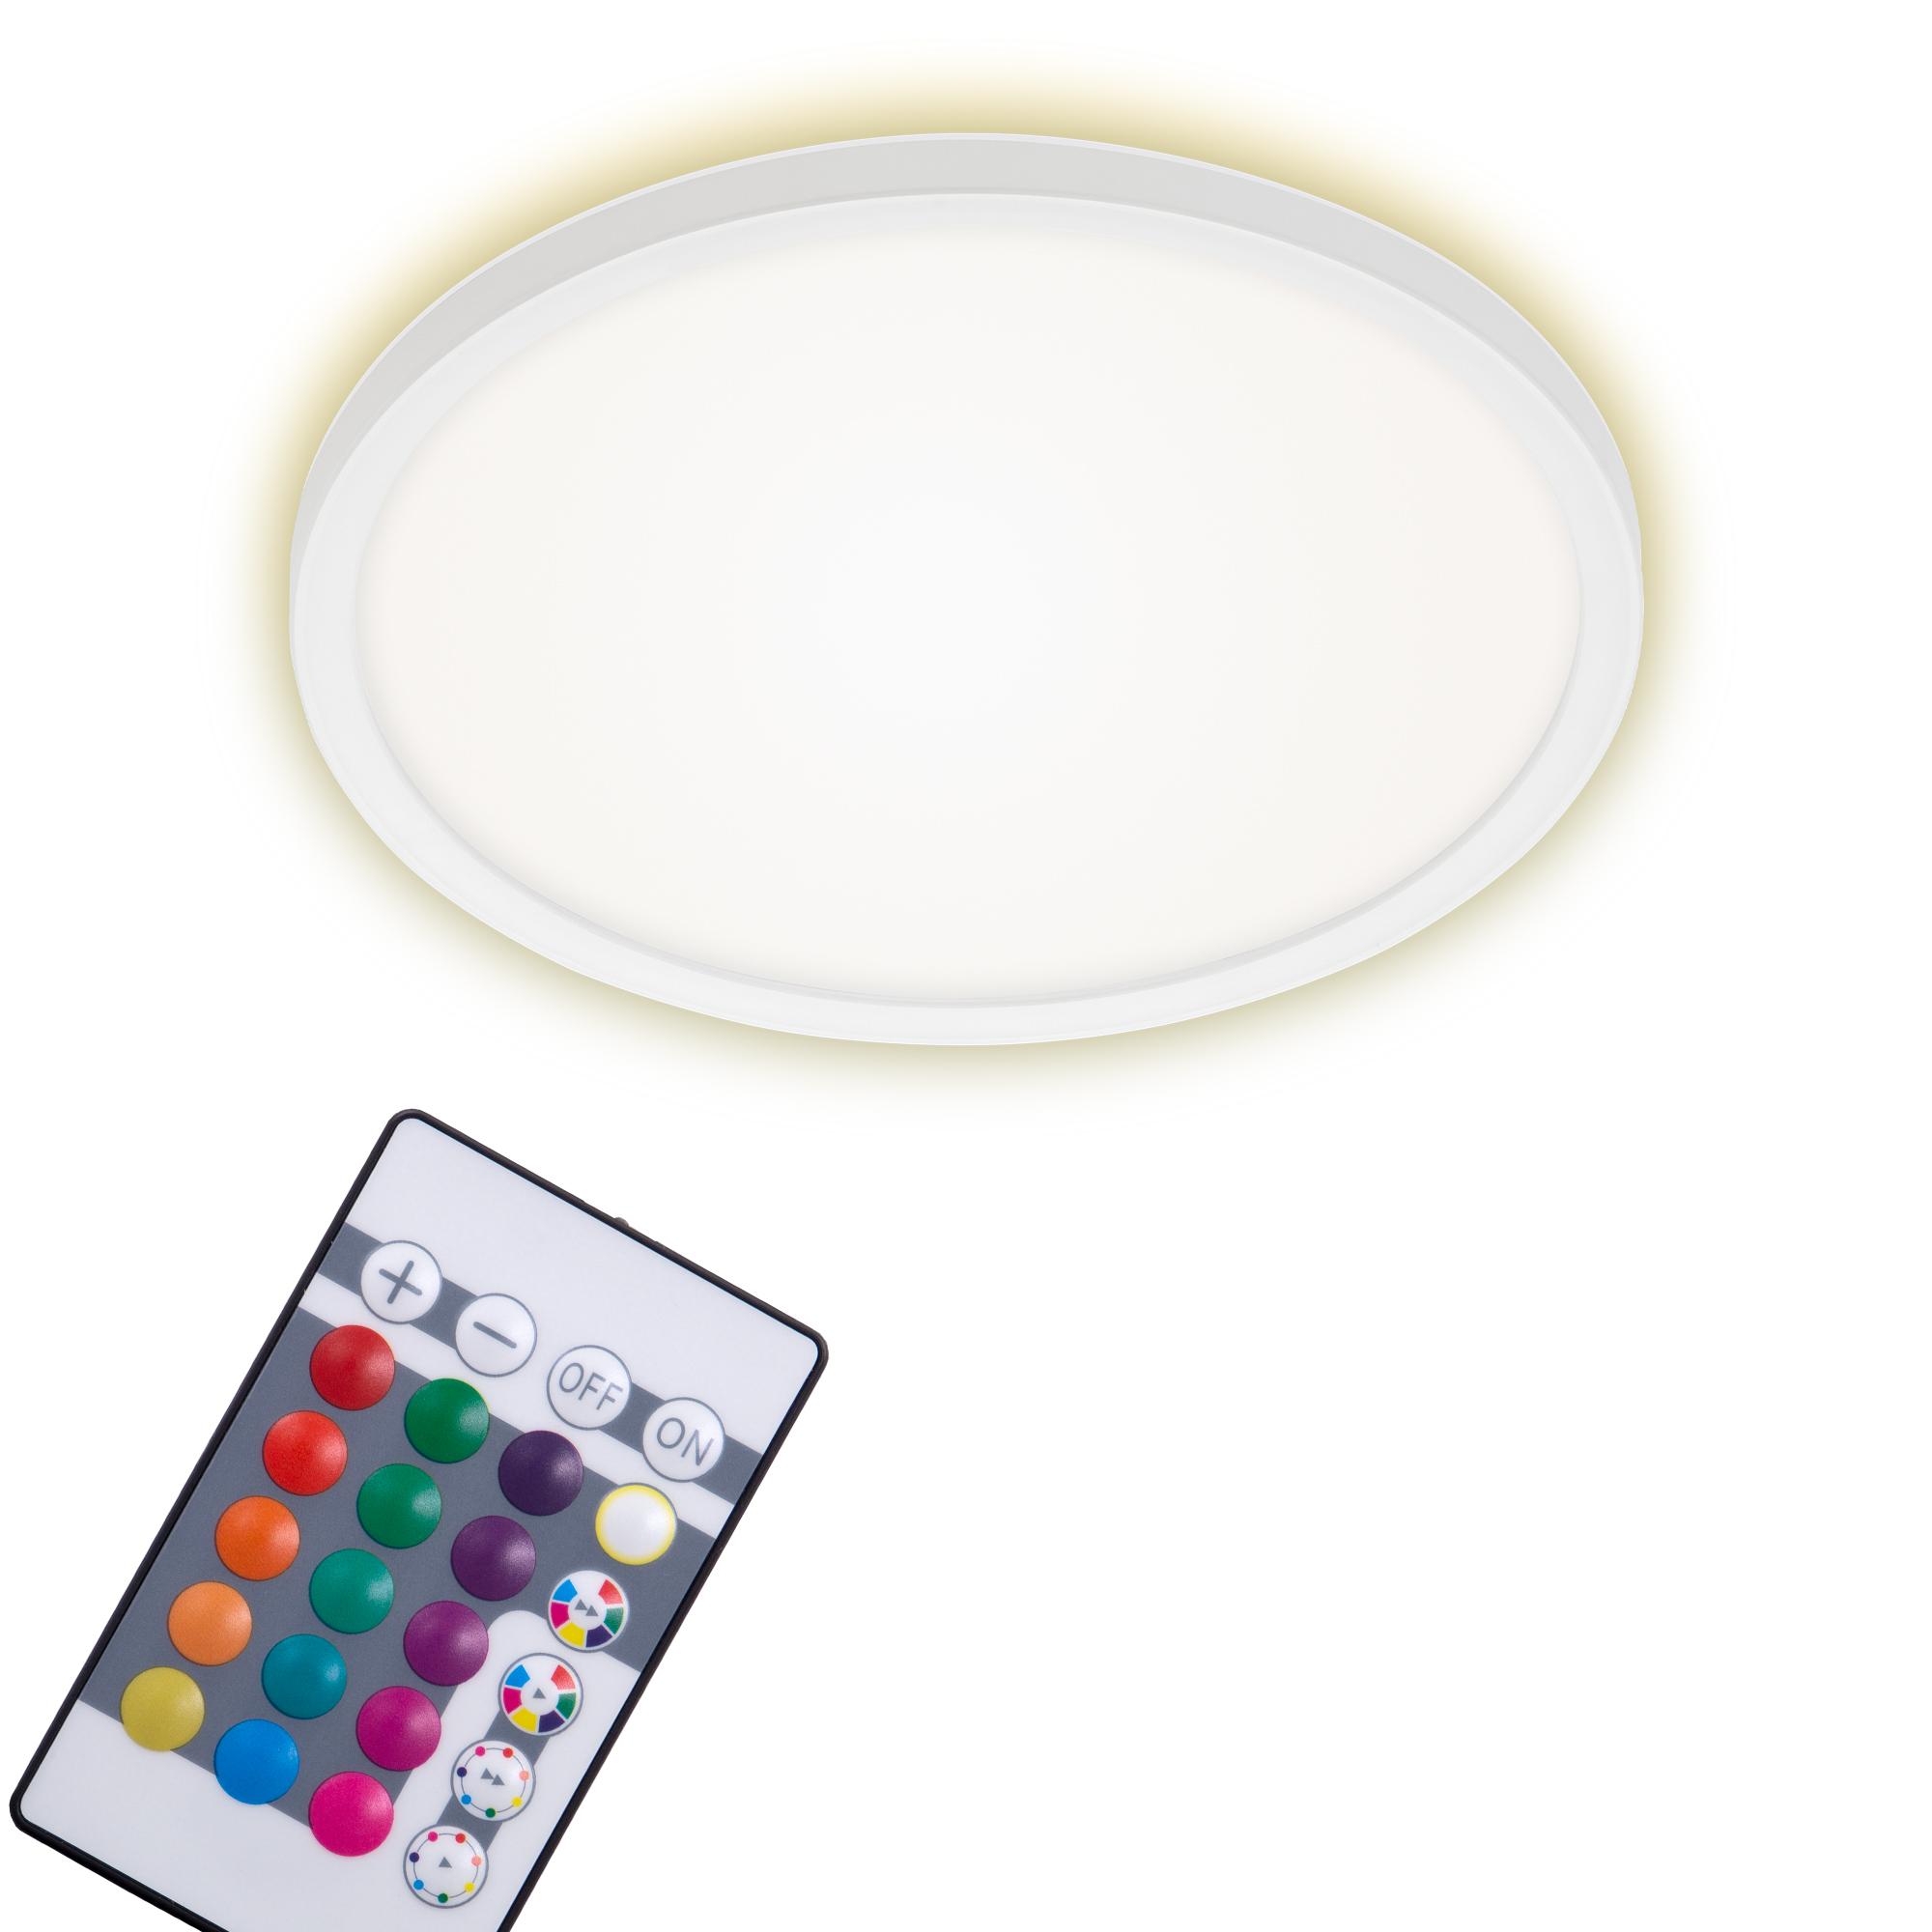 SLIM LED Panel, Ø 29,3 cm, 1850 LUMEN, 15 WATT, Weiß